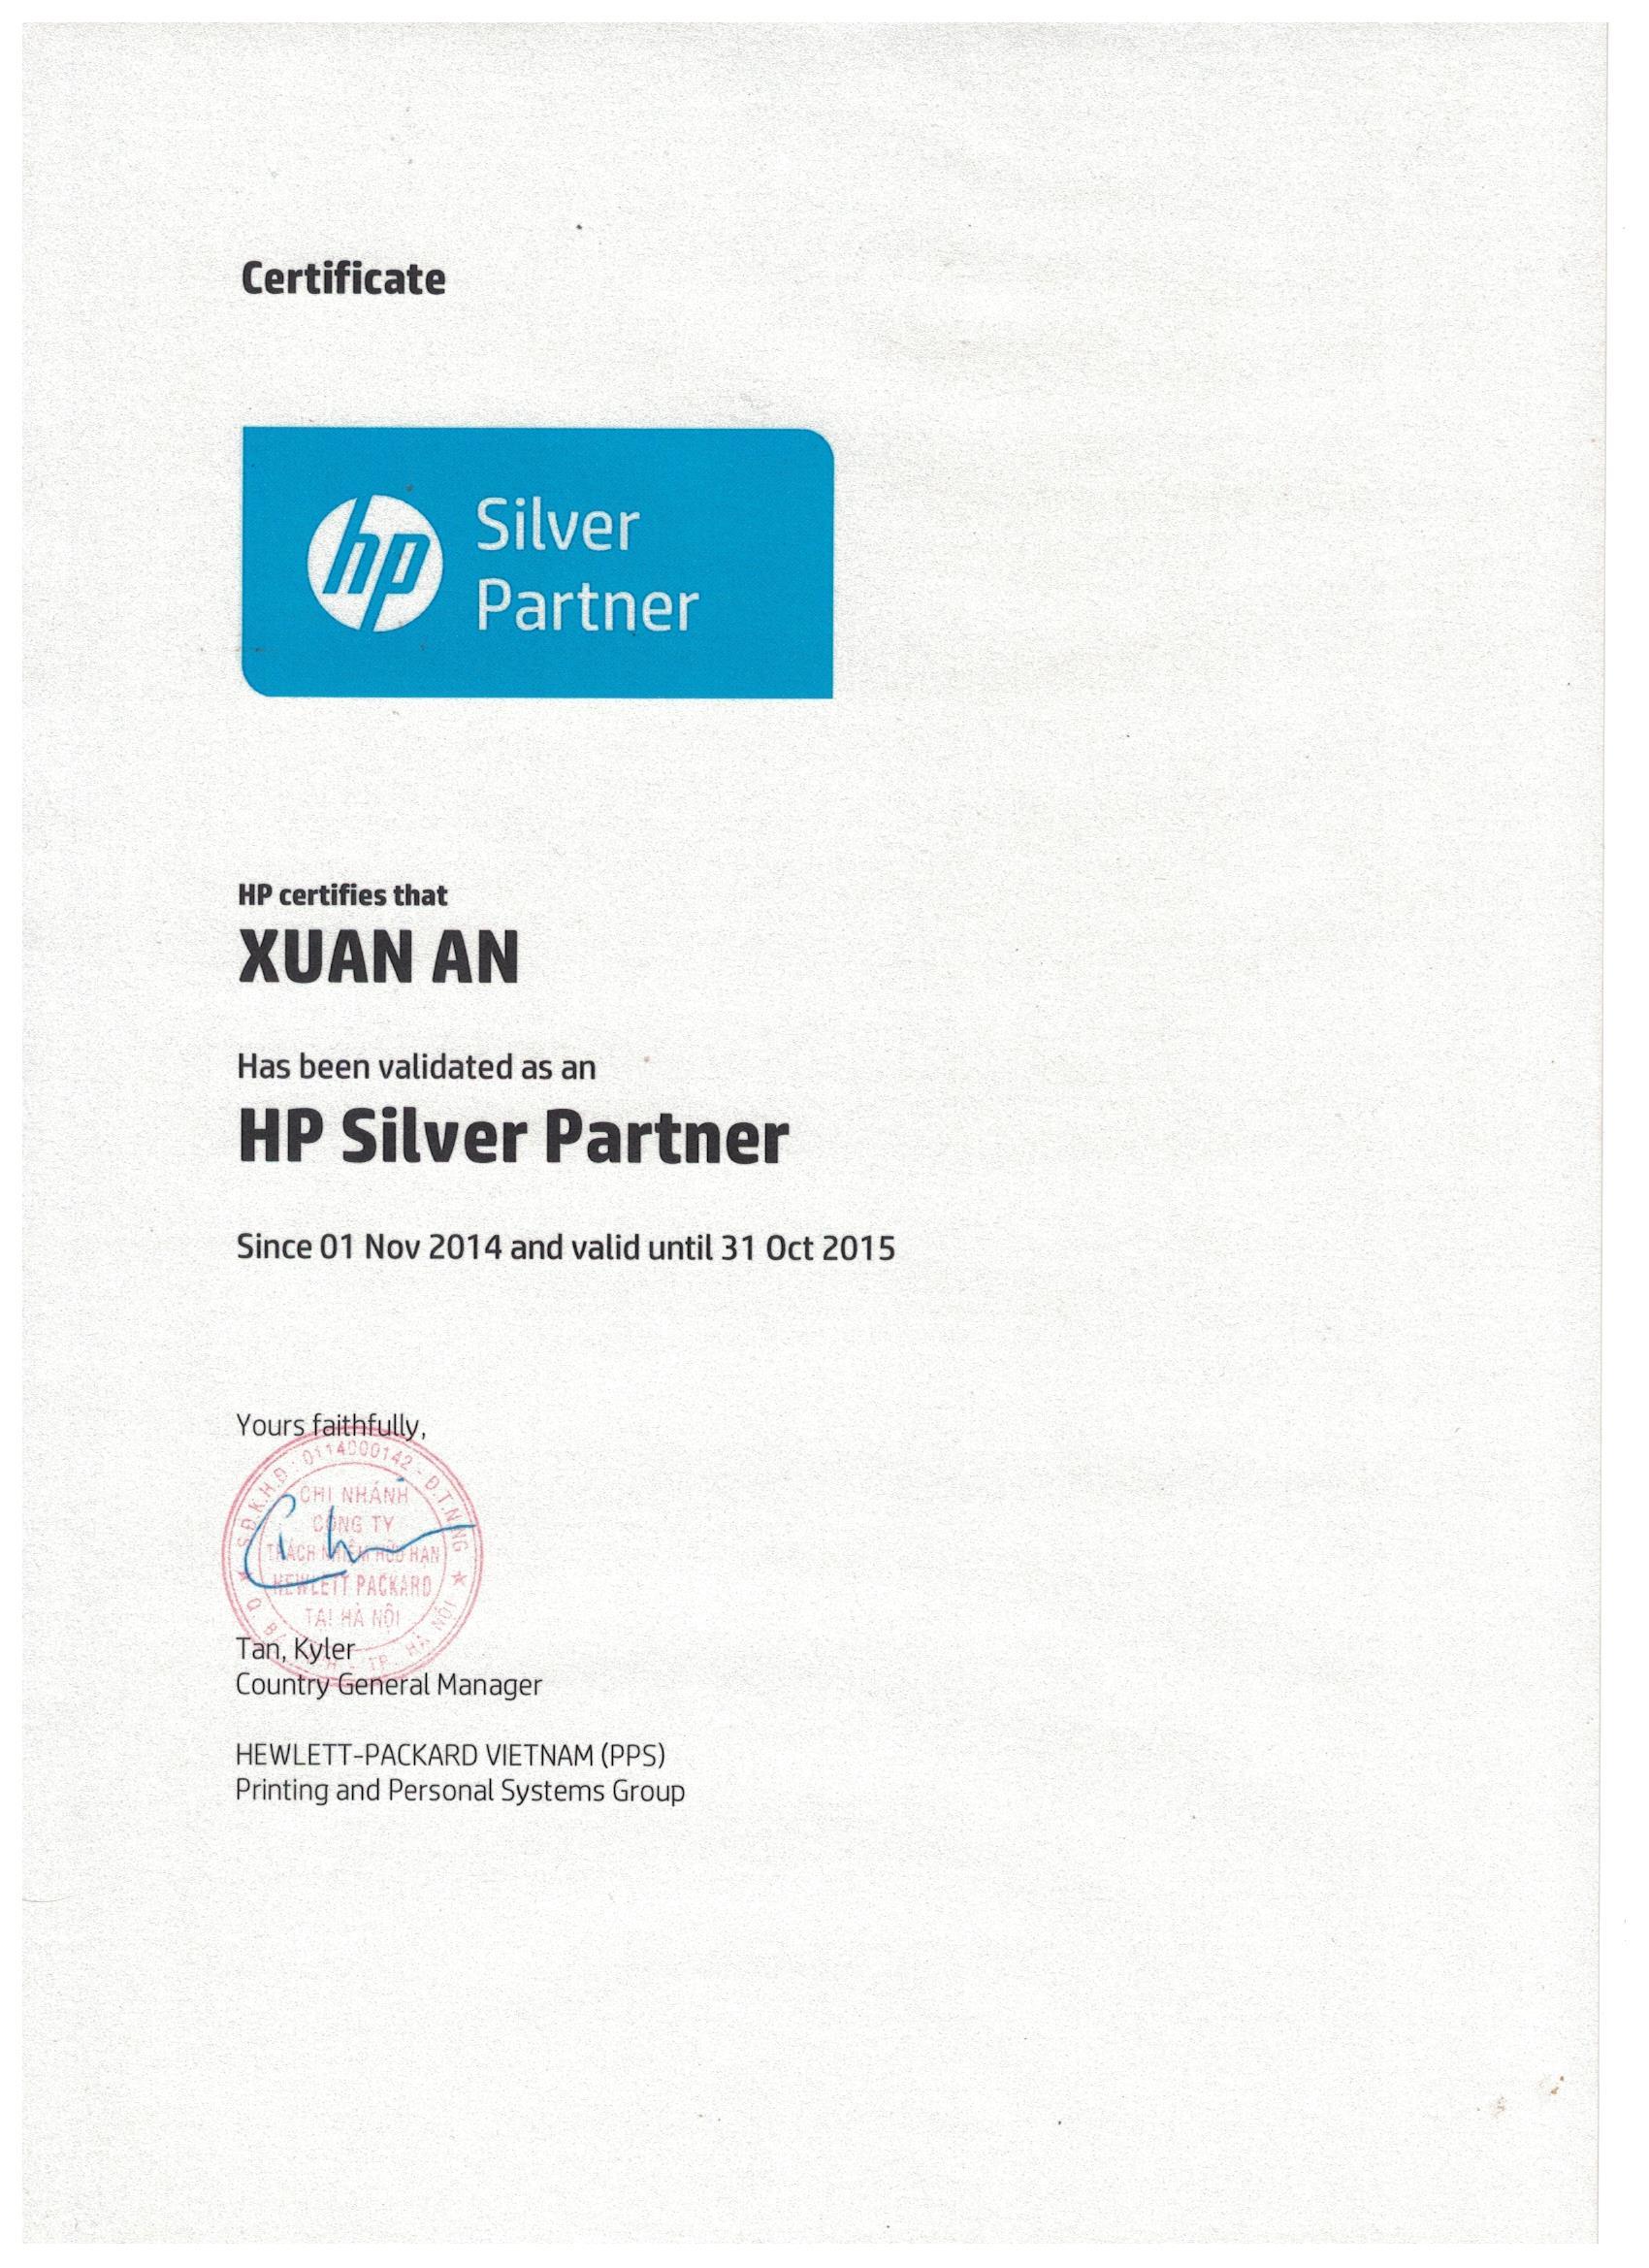 HP Probook 450 G4 - Z6T17PA (Silver)